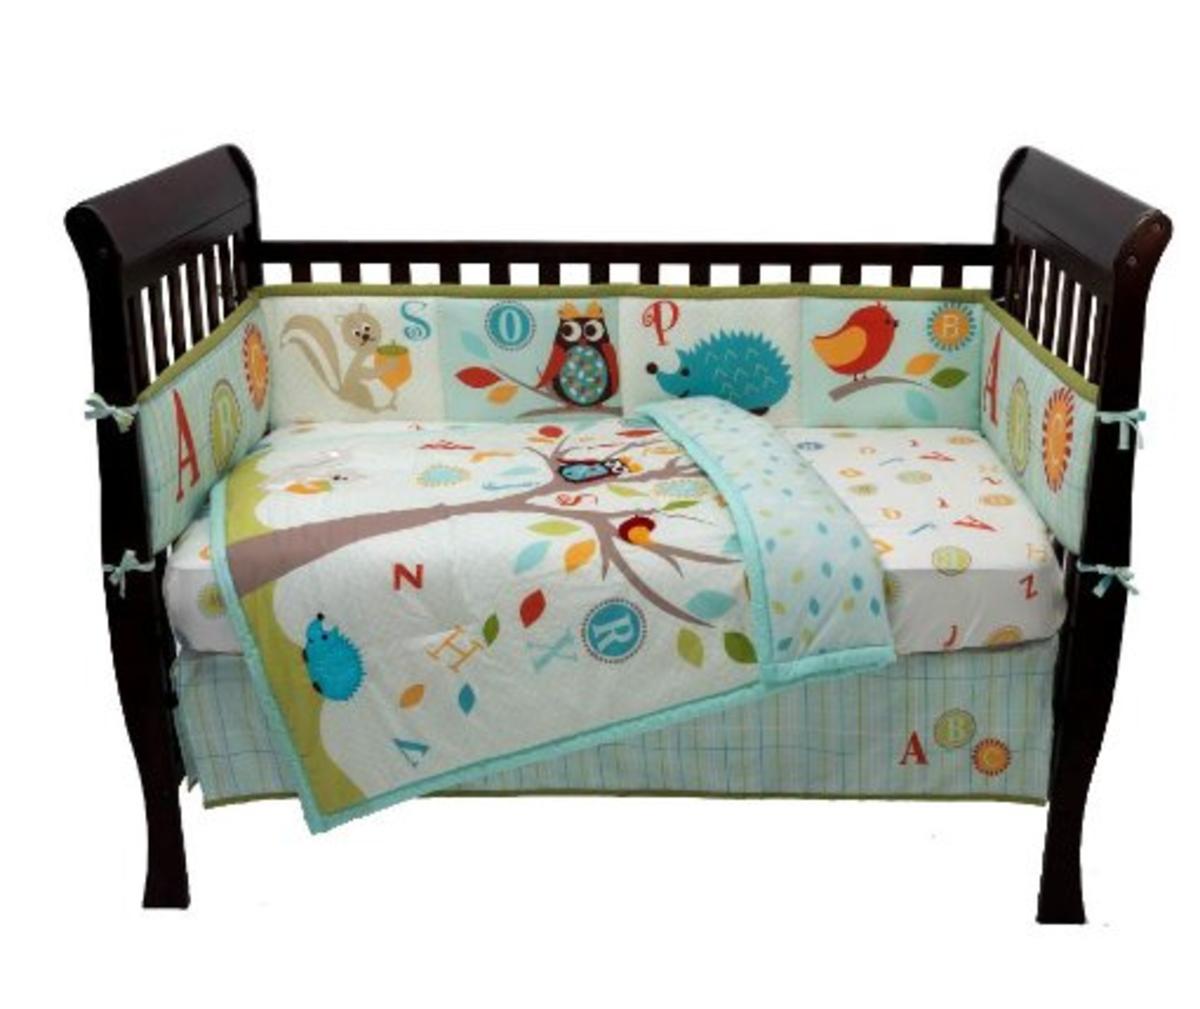 Kidsline Willow Crib Bedding